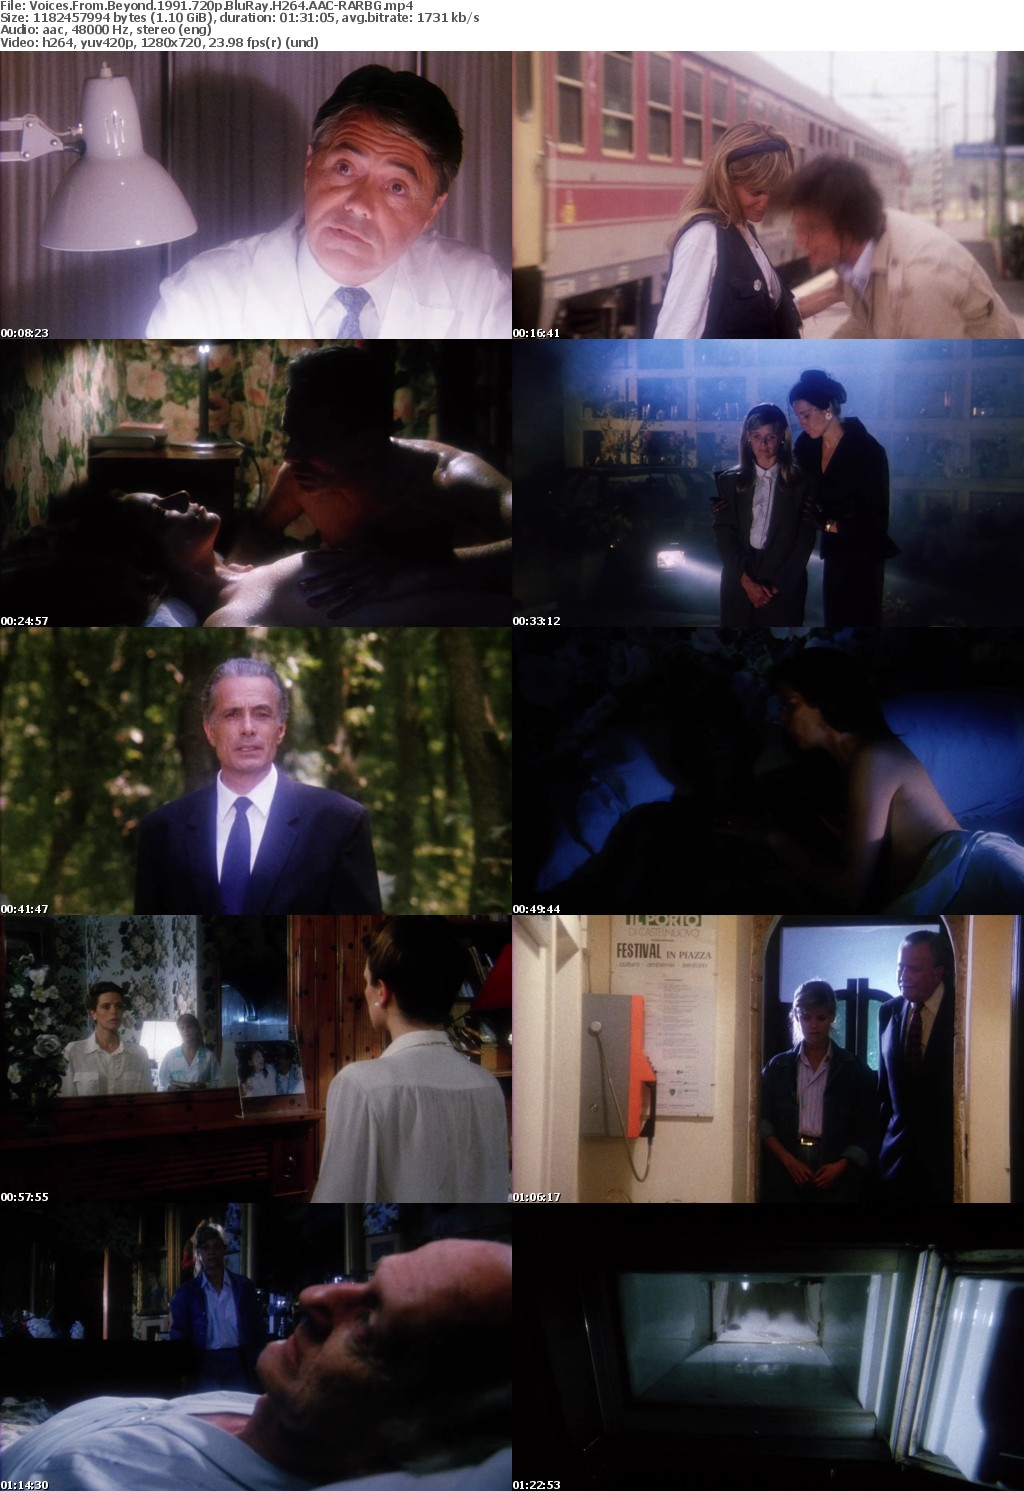 Voices From Beyond (1991) 720p BluRay H264 AAC-RARBG